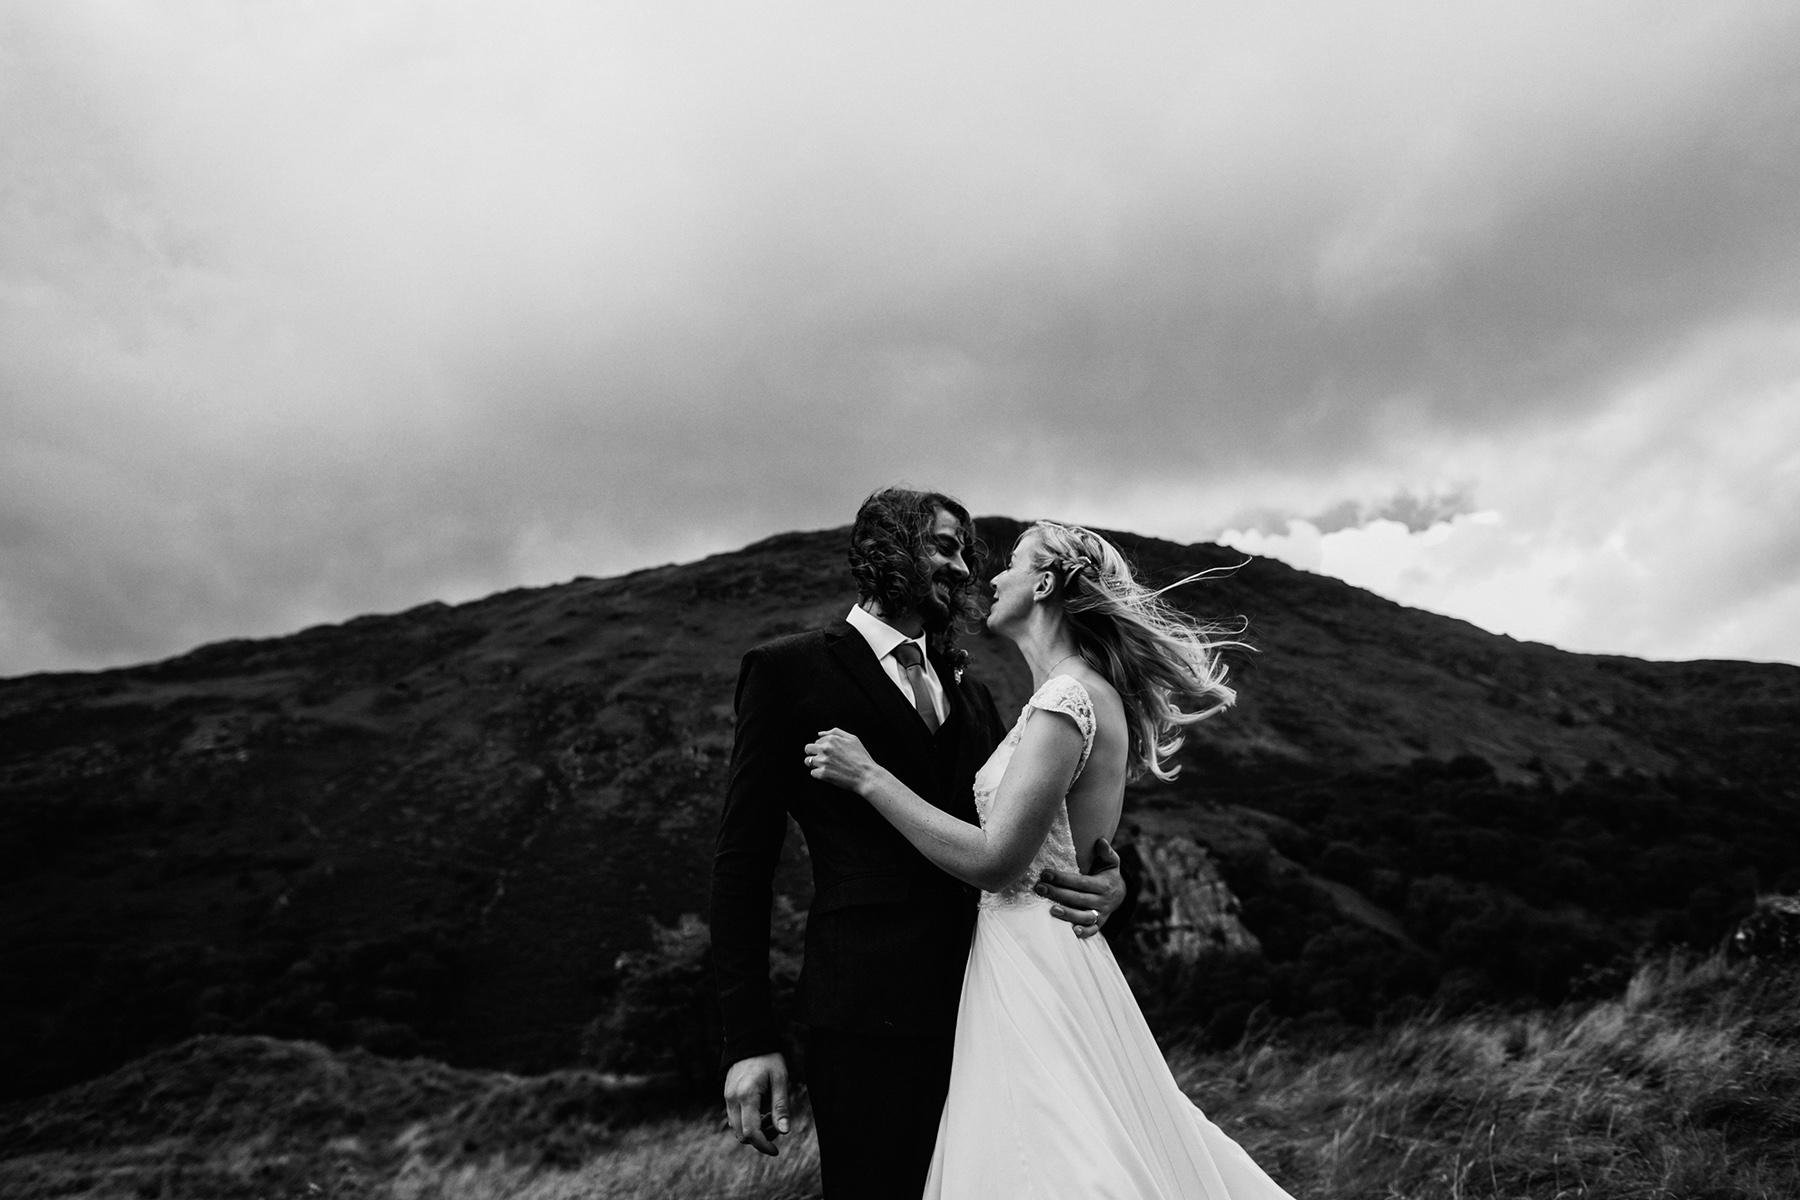 Snowdonia-Wales-Wedding-Photos-0354.jpg